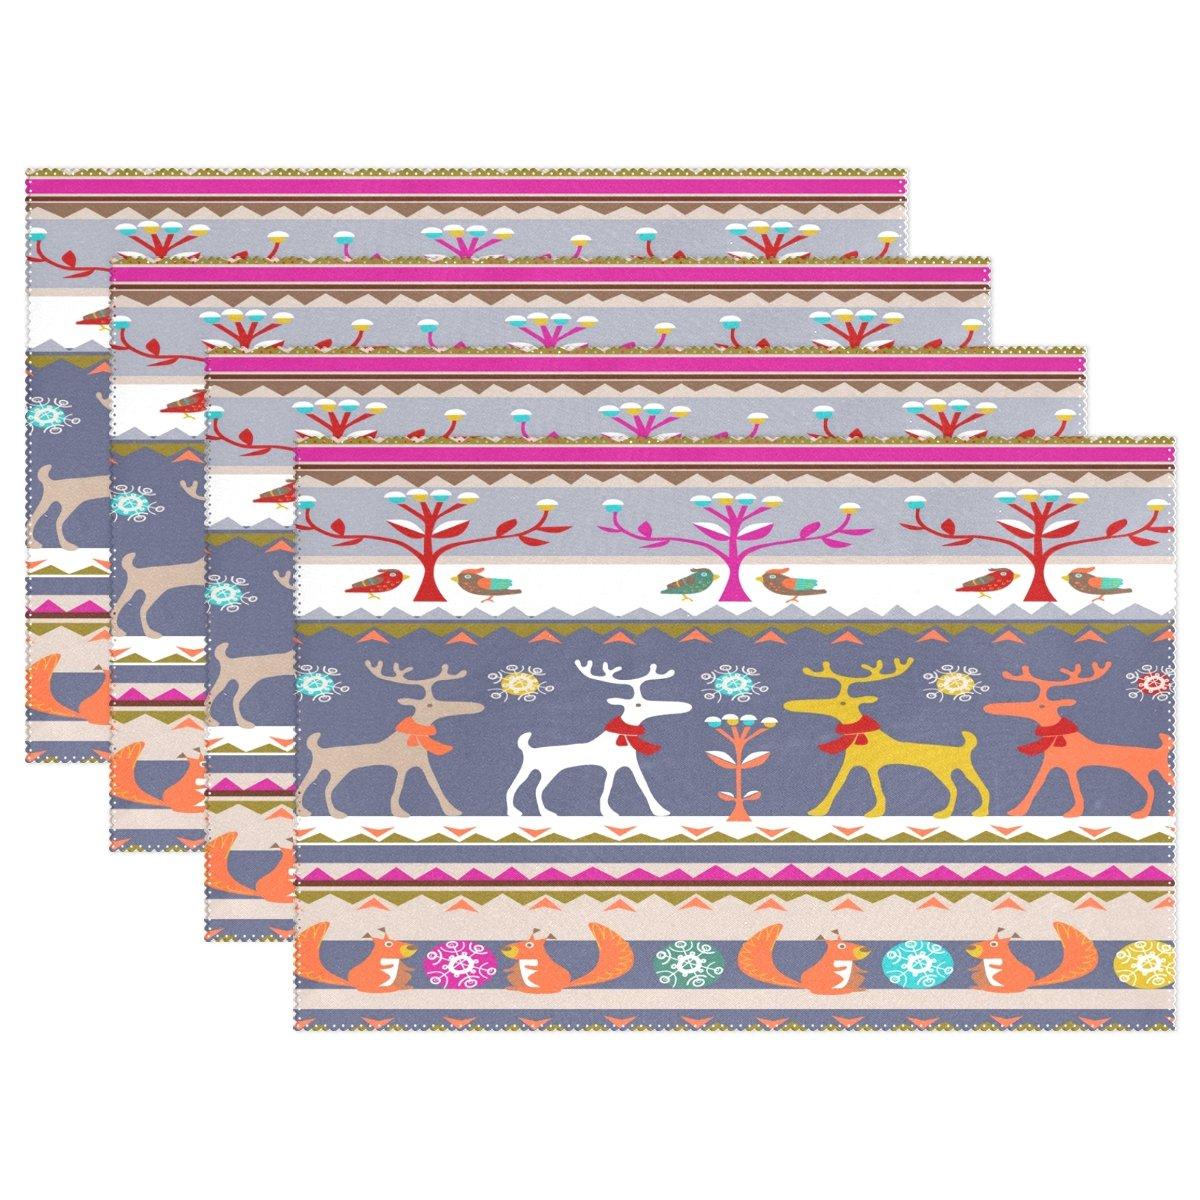 Wozo新しい年フォックス鹿ツリー鳥プレースマットテーブルマット12